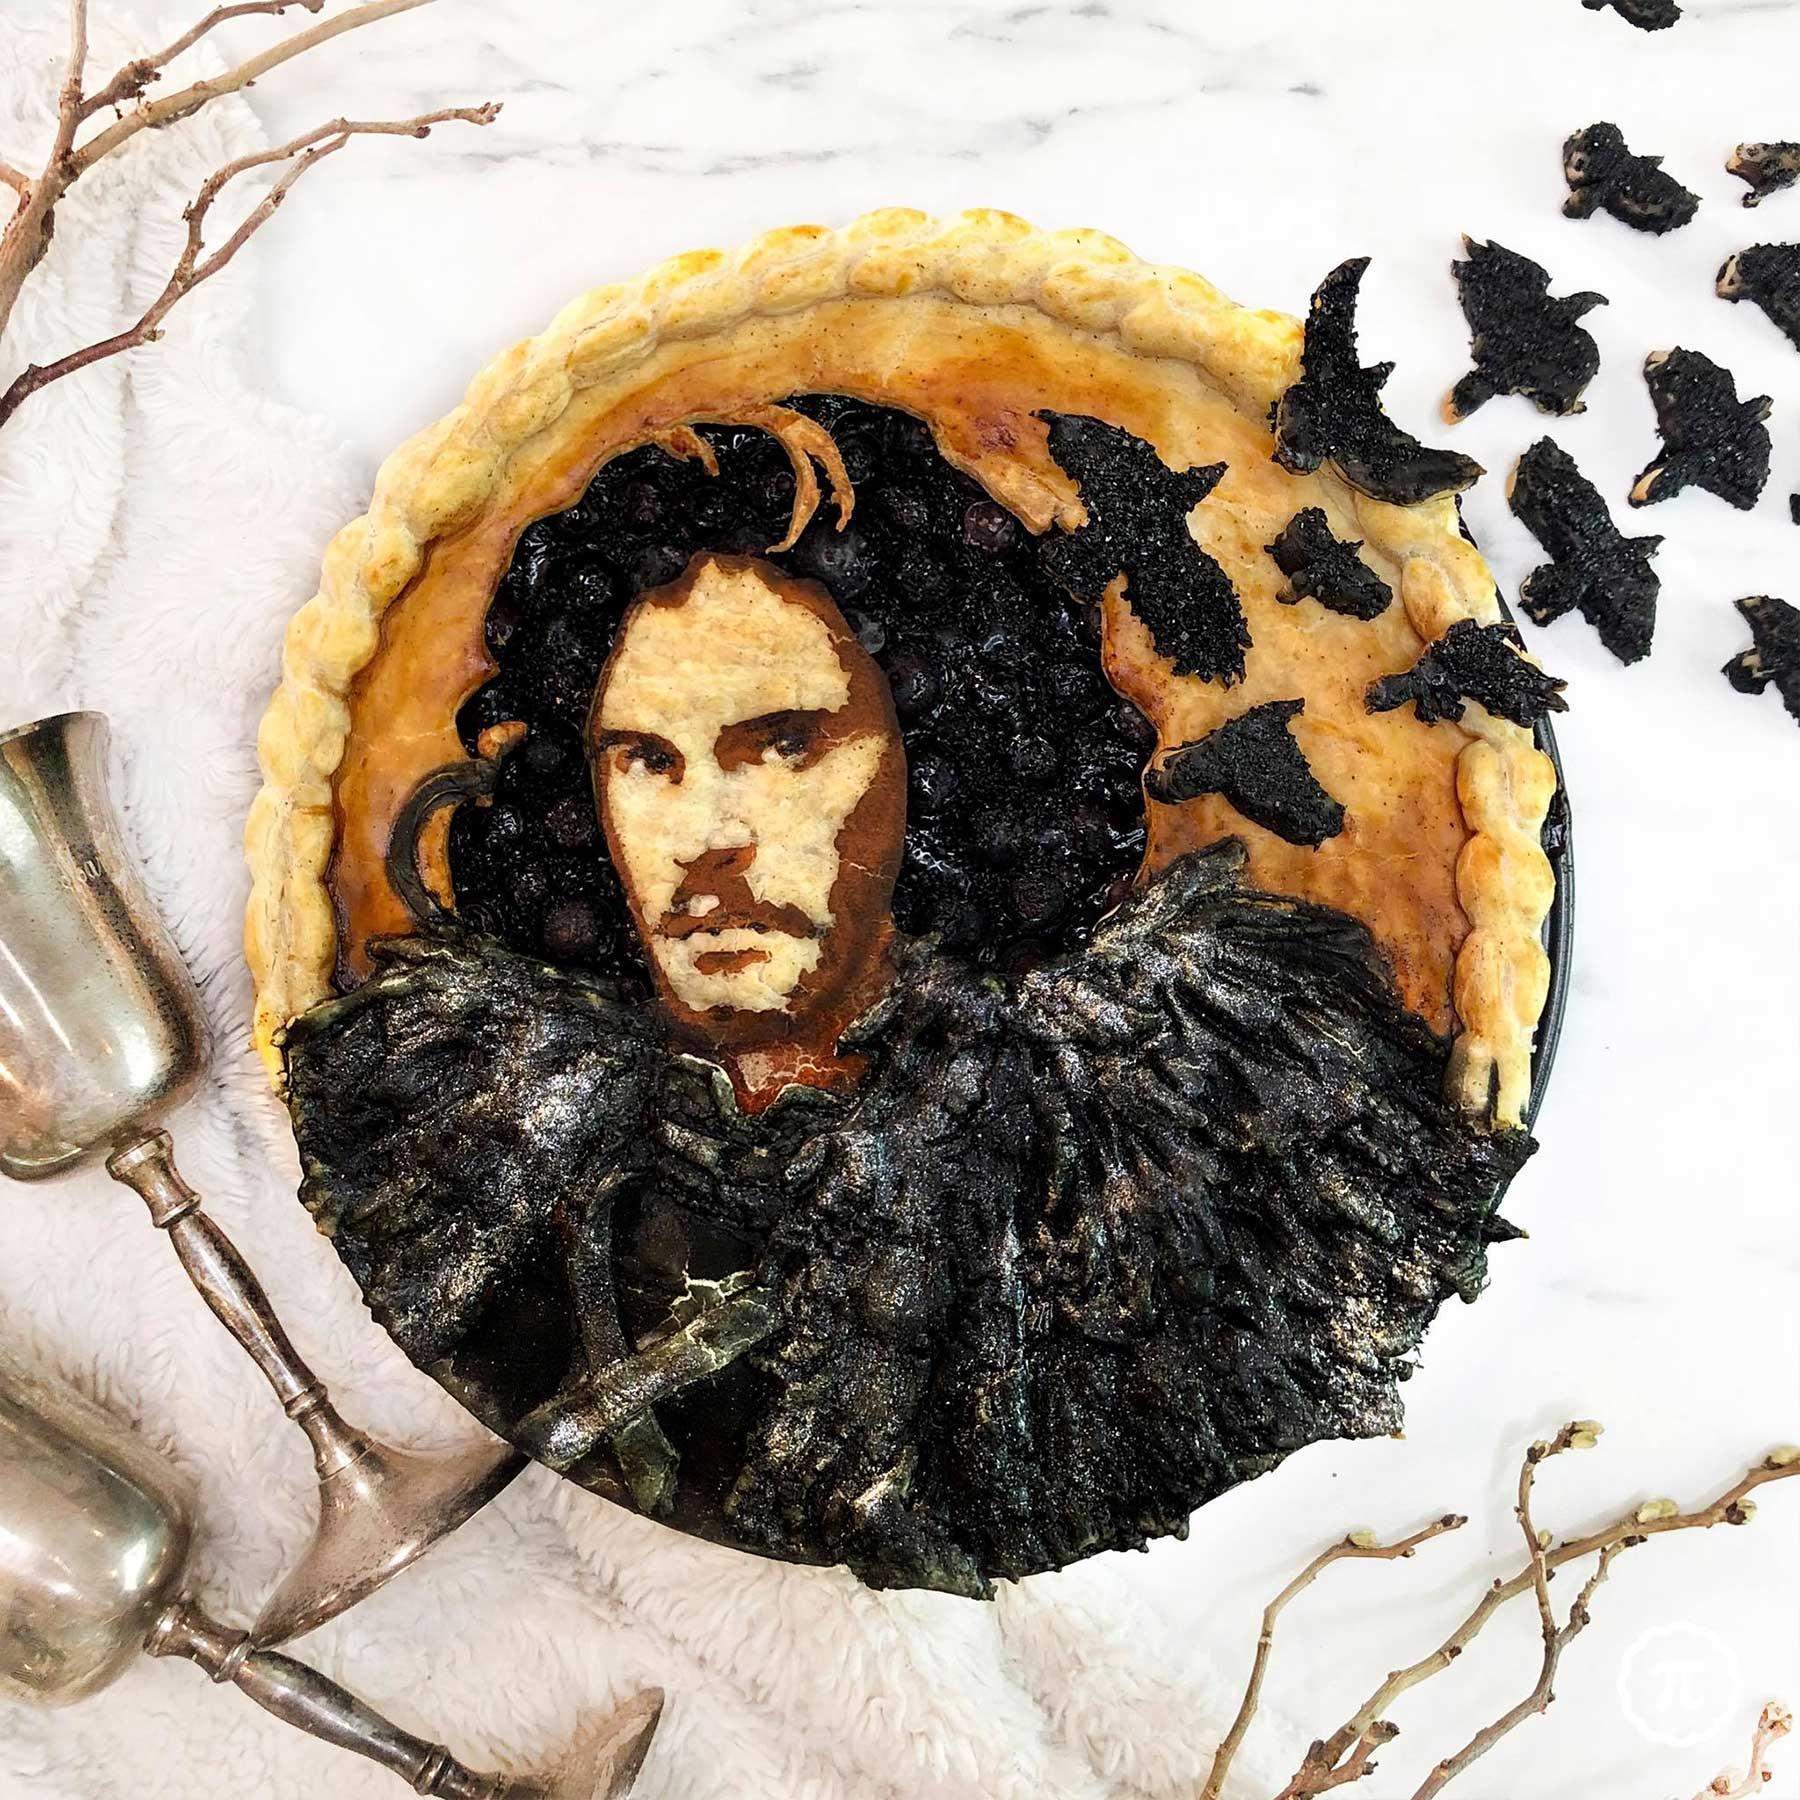 Kreative Kuchenkunst von Jessica Clark-Bojin piesareawesome-Jessica-Clark-Bojin_10